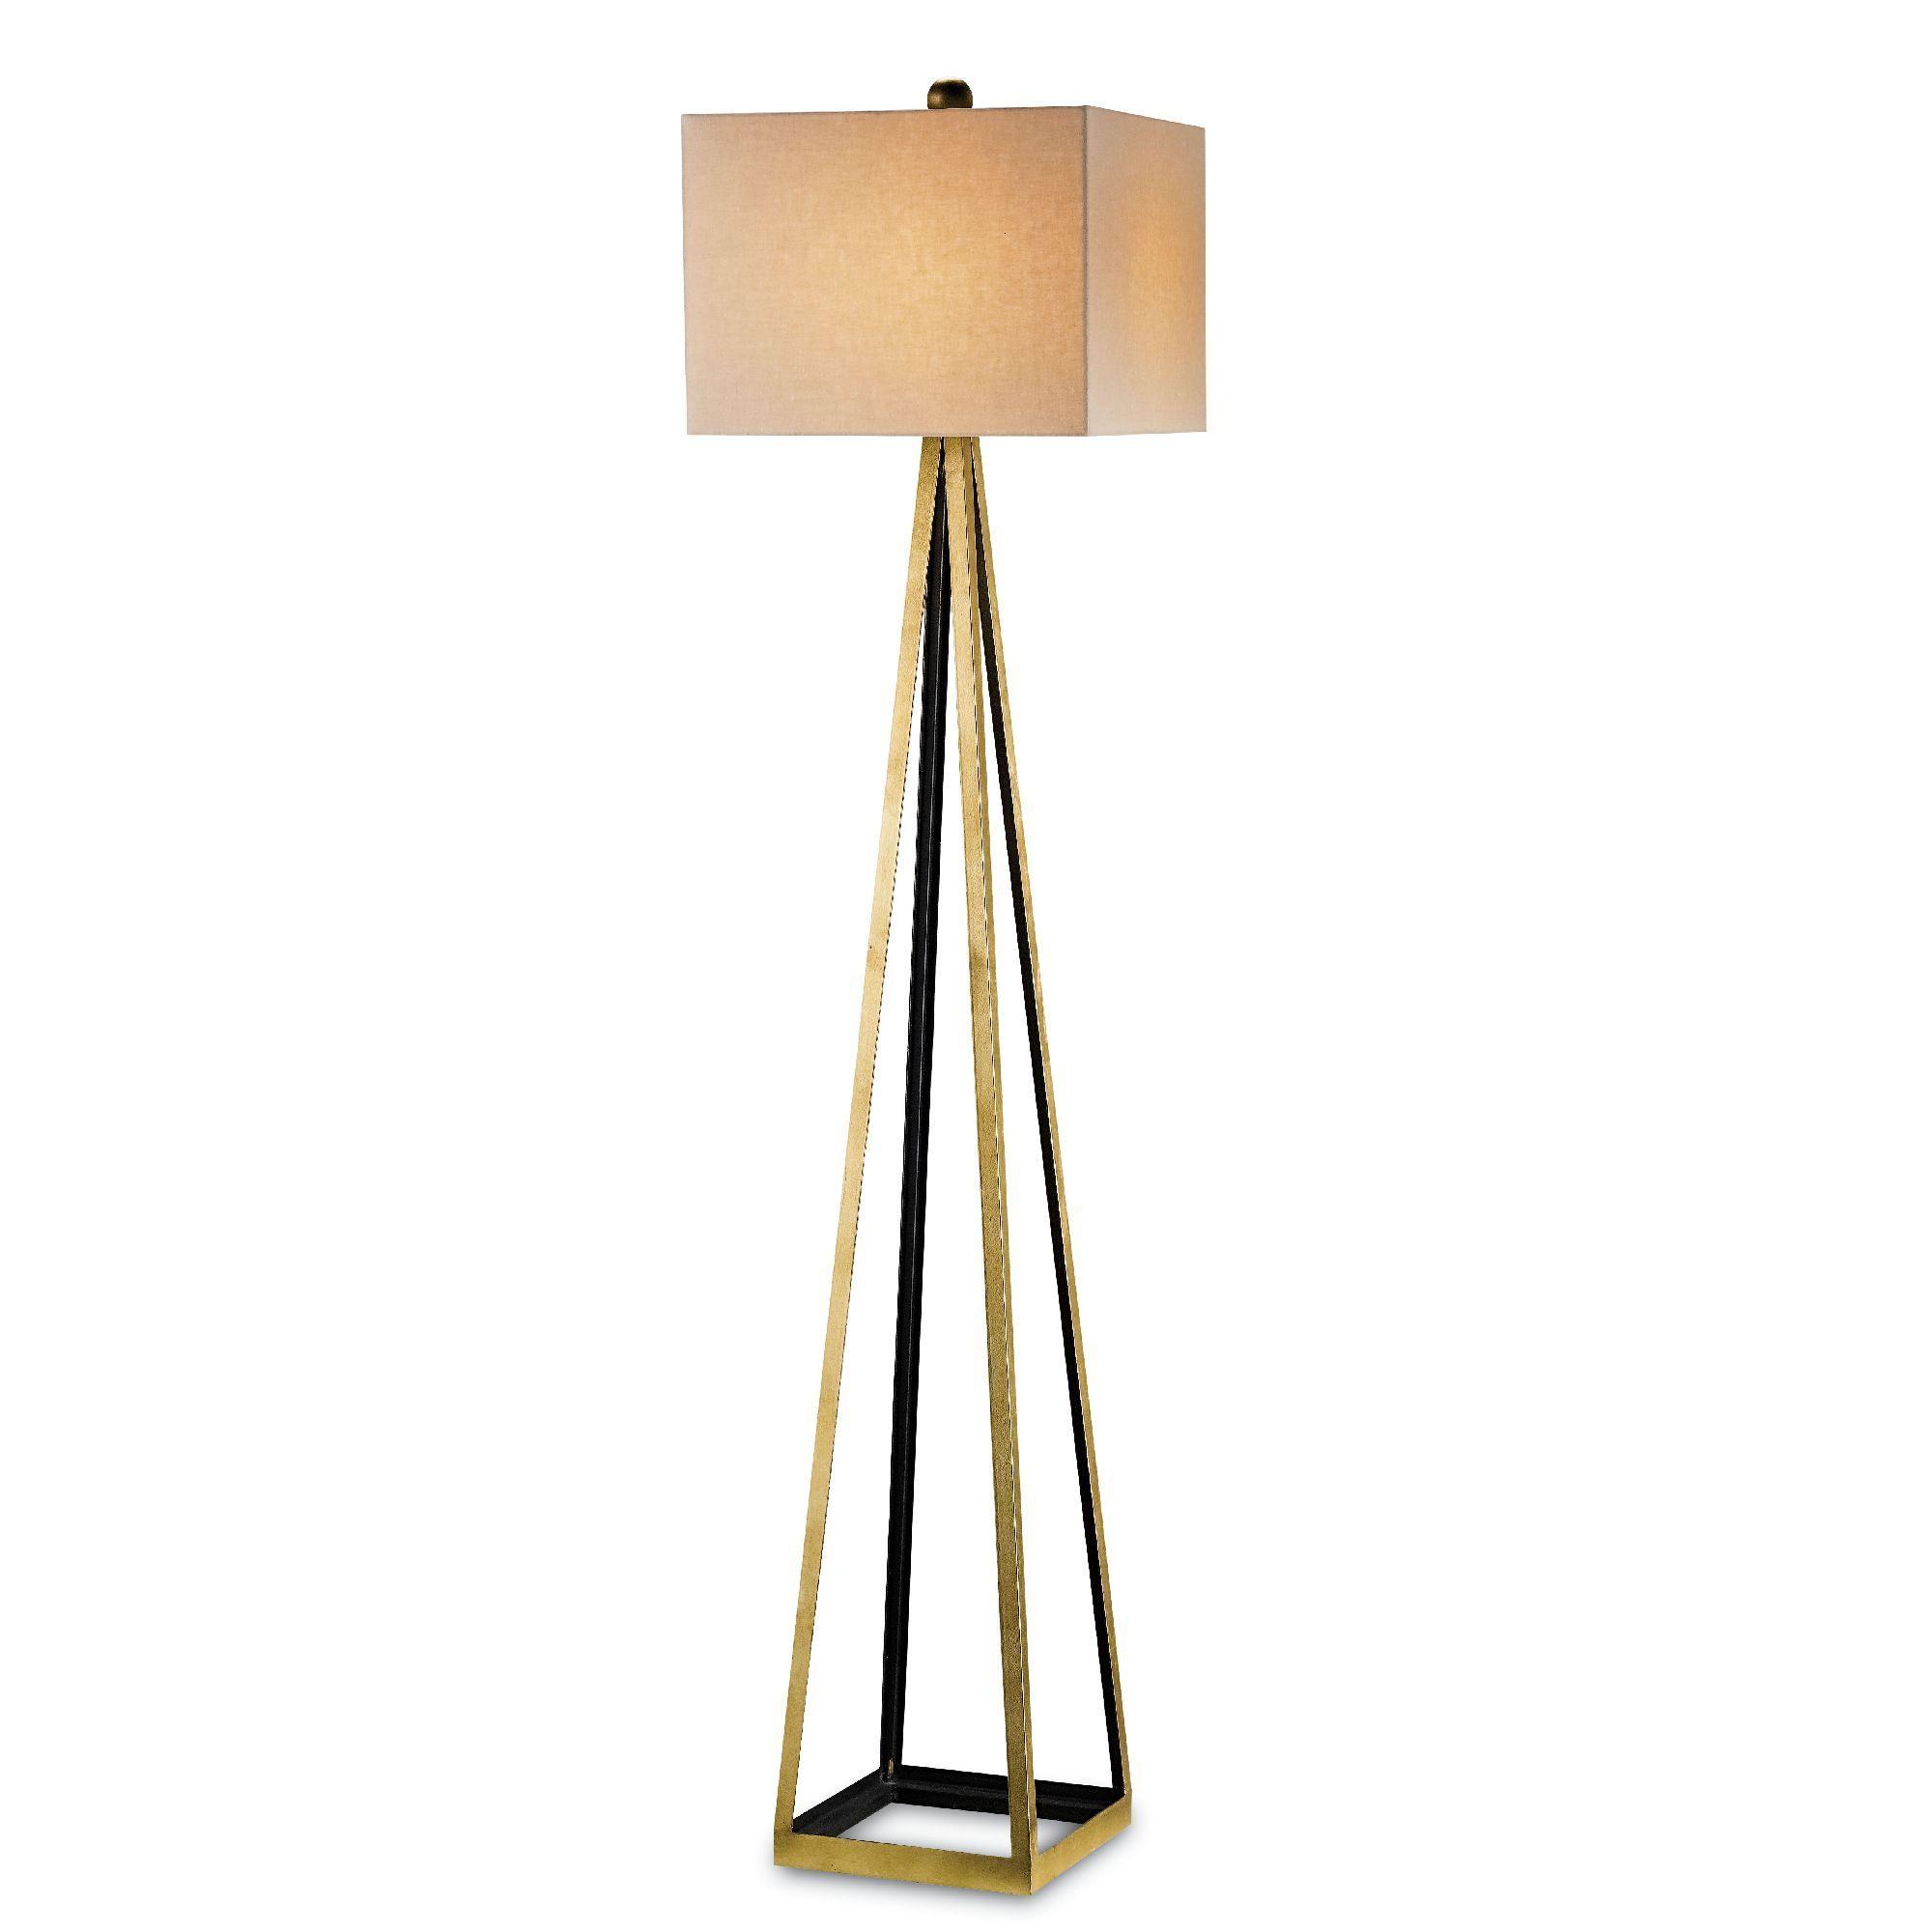 Currey And Company Bel Mondo Floor Lamp Gold Floor Lamp Floor Lamp Contemporary Floor Lamps